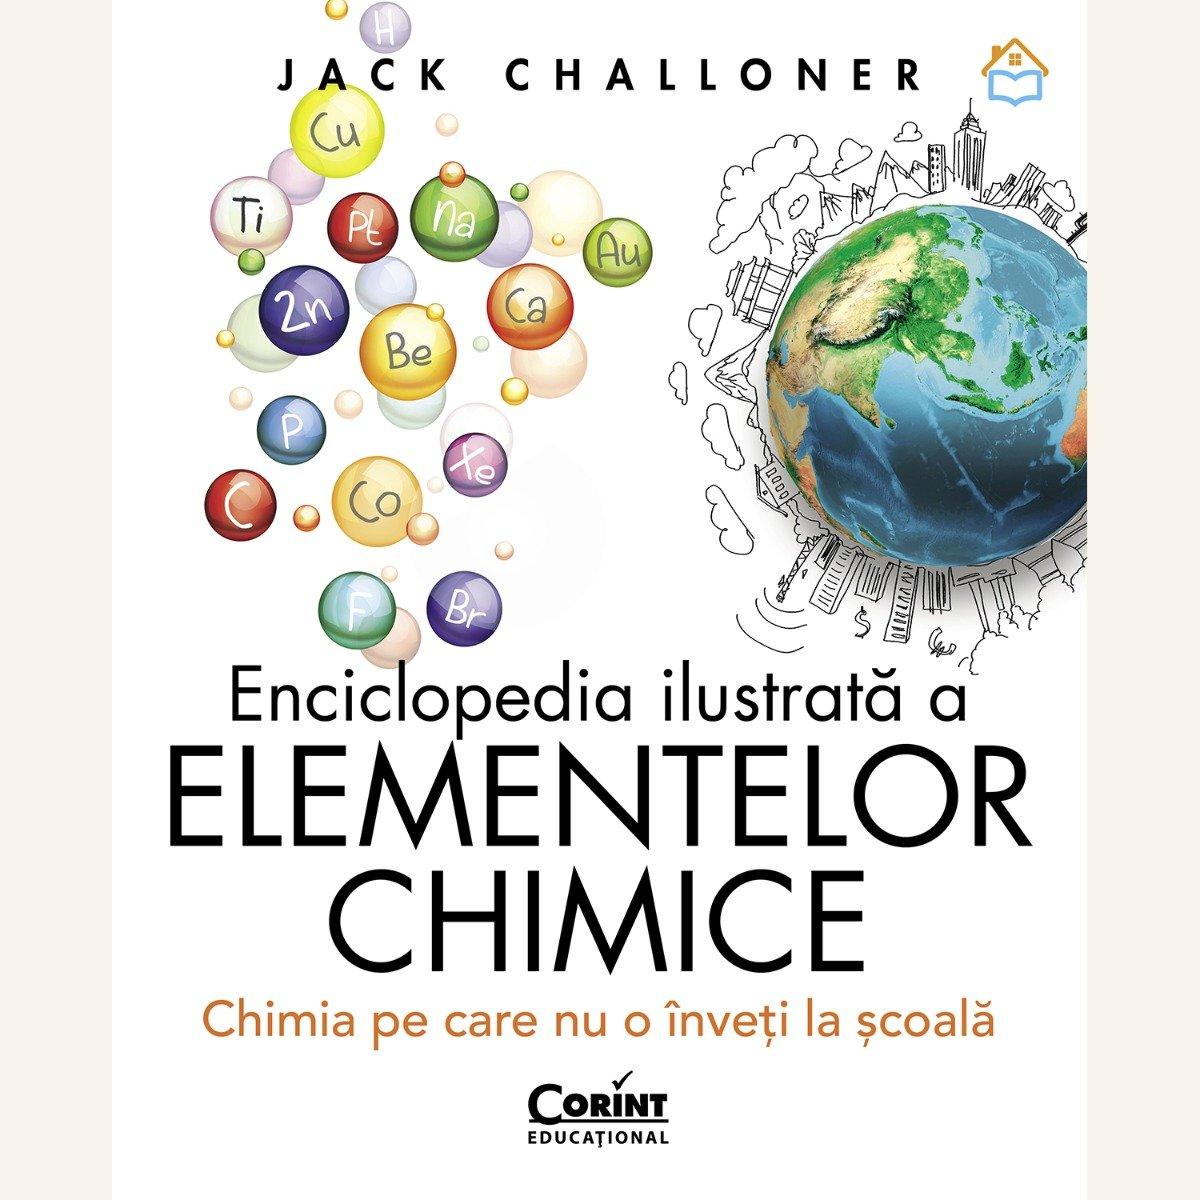 Enciclopedia ilustrata a elementelor chimice, Jack Challoner